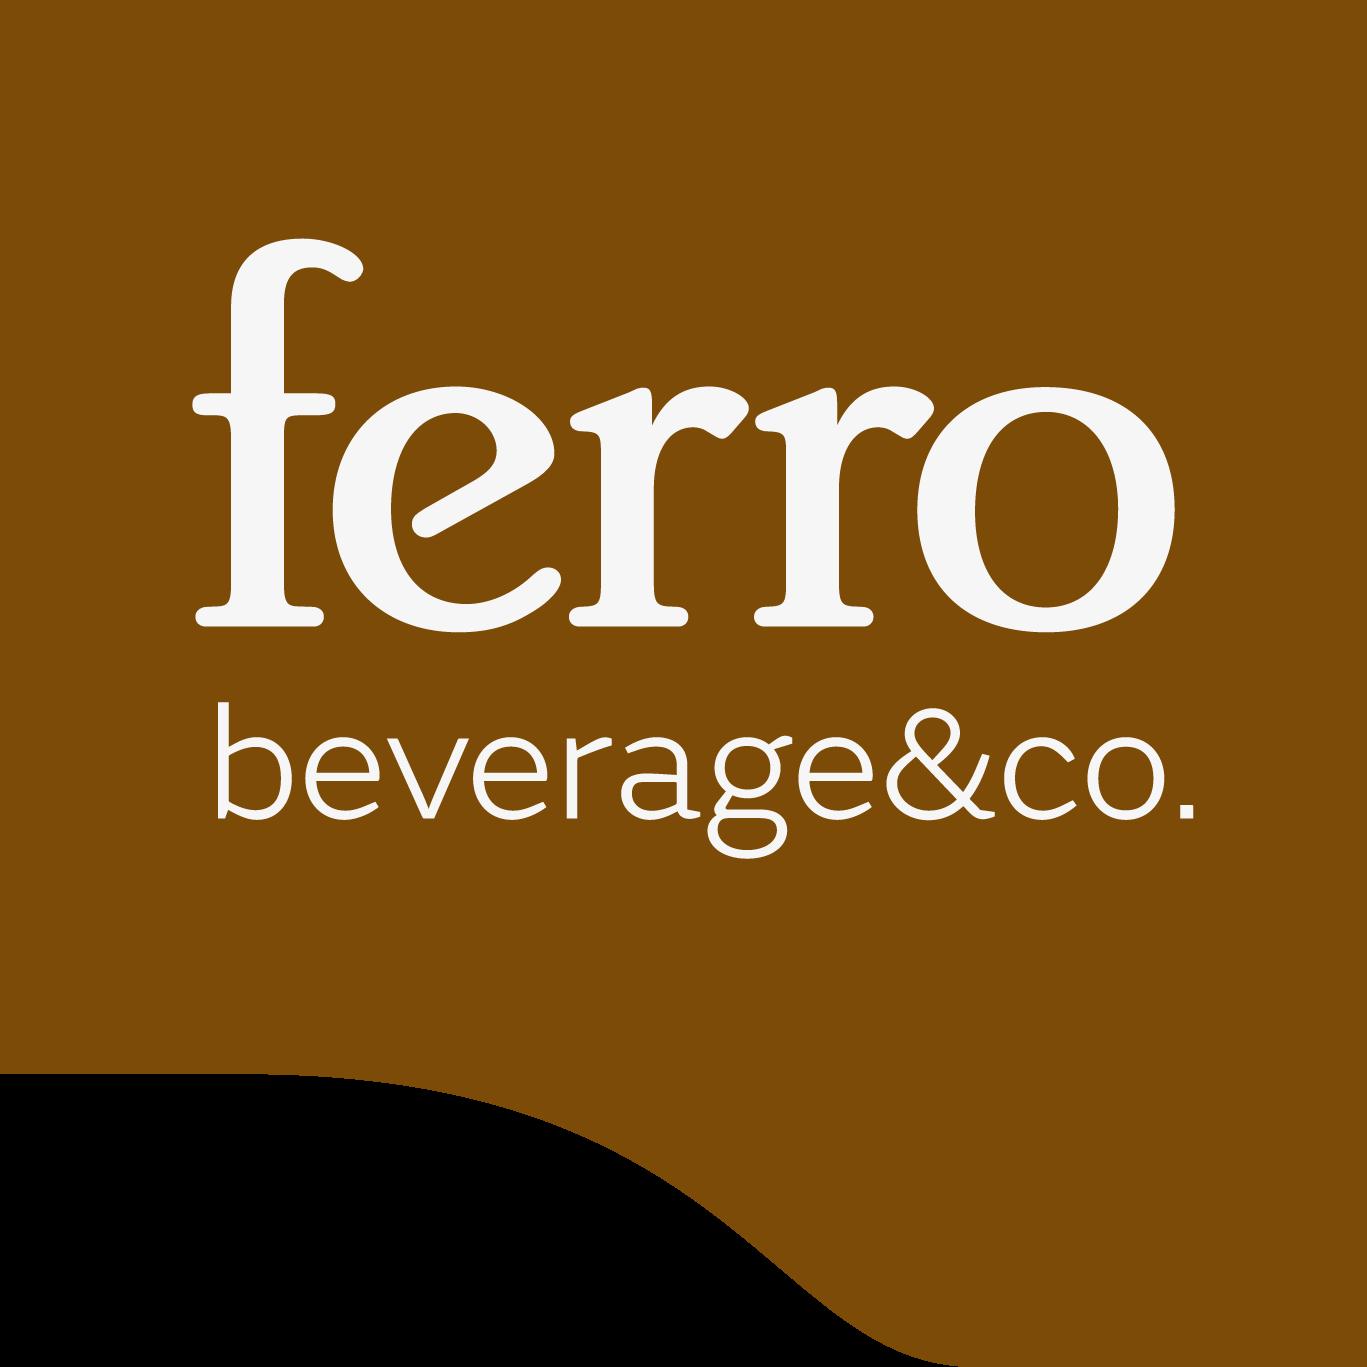 Logo Ferro beverage & co.